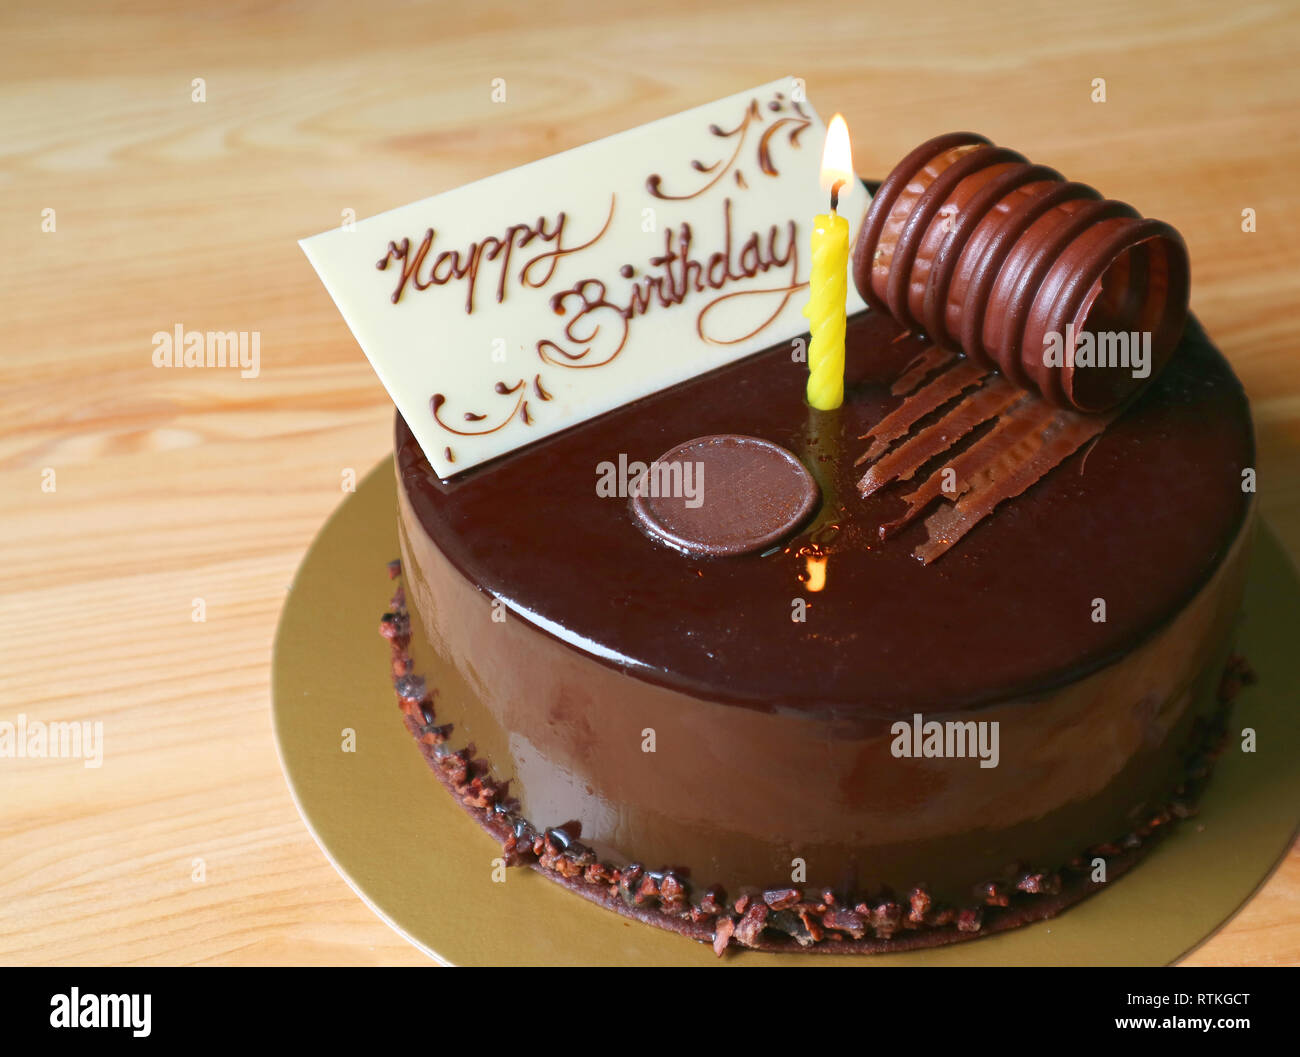 Fabulous Moist Chocolate Birthday Cake Topped With Edible White Chocolate Personalised Birthday Cards Beptaeletsinfo